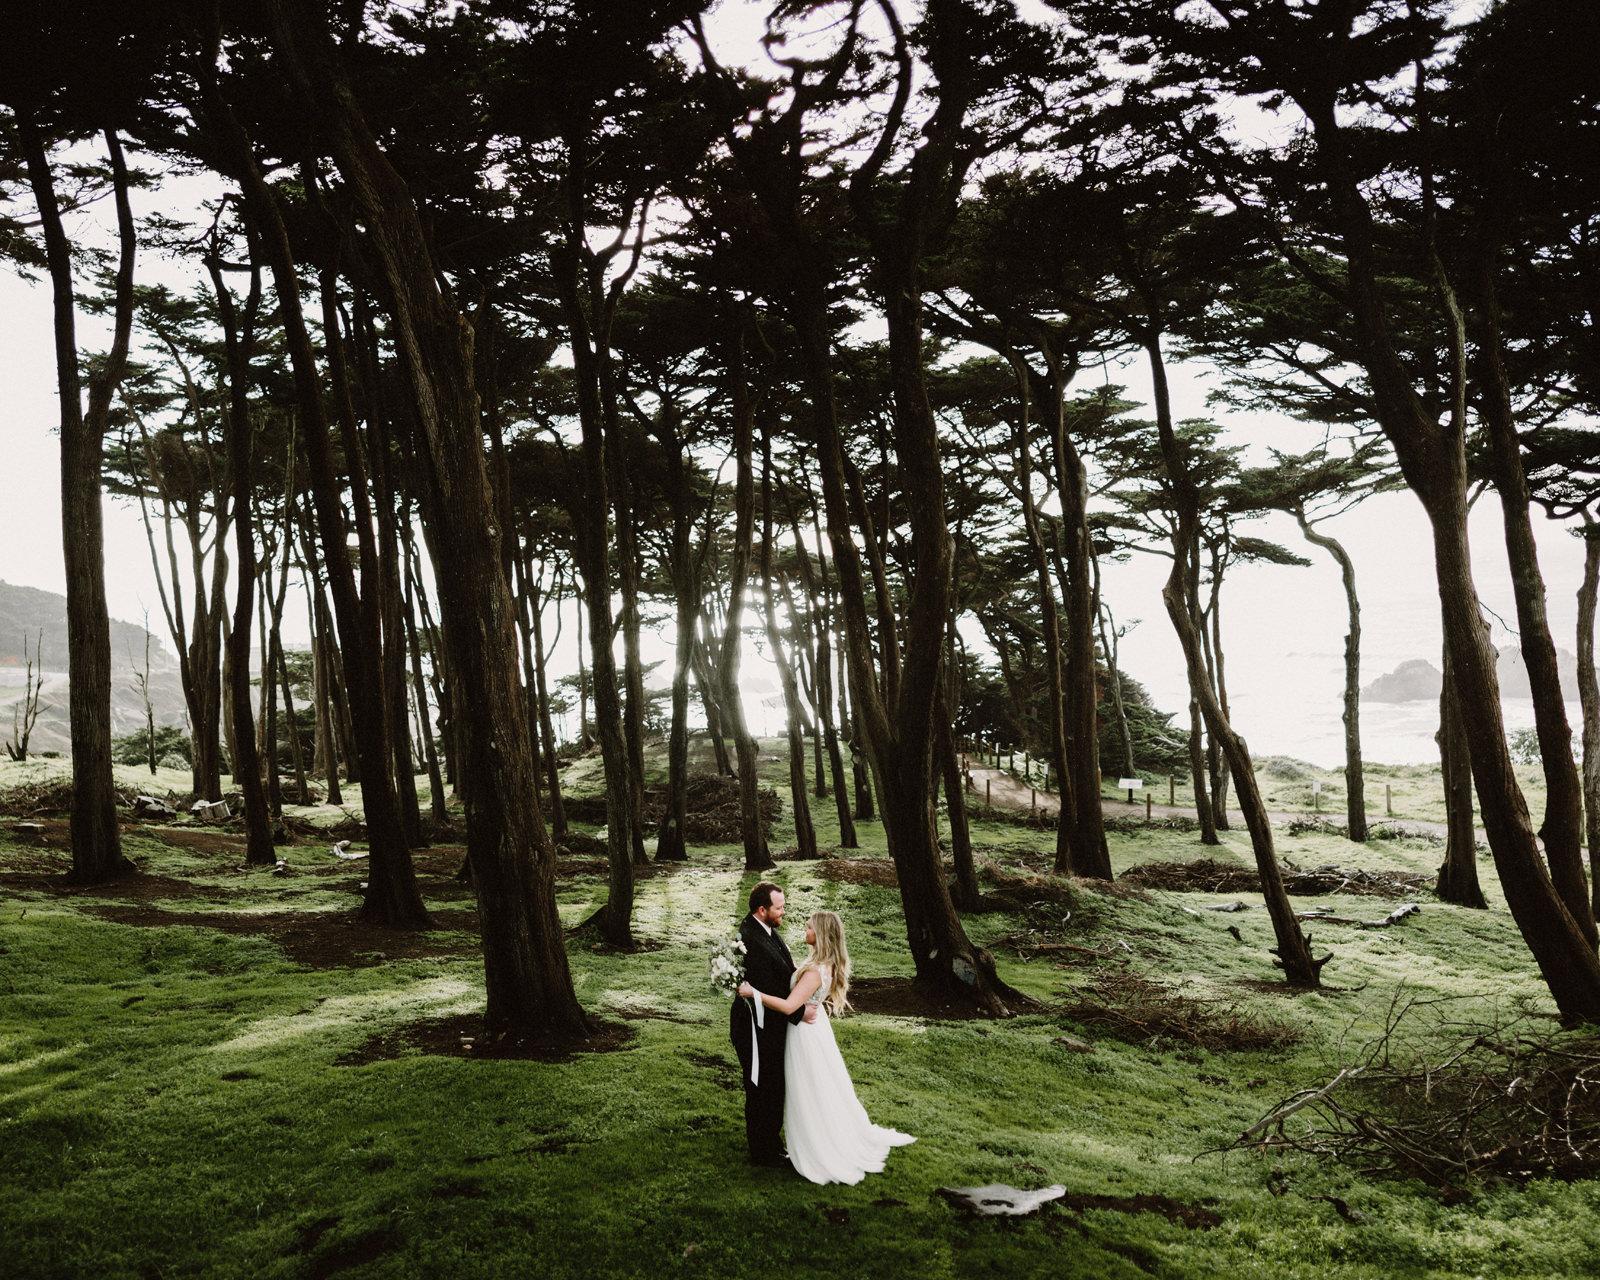 san-francisco-city-hall-elopement-40 SAN FRANCISCO CITY HALL INTIMATE WEDDING